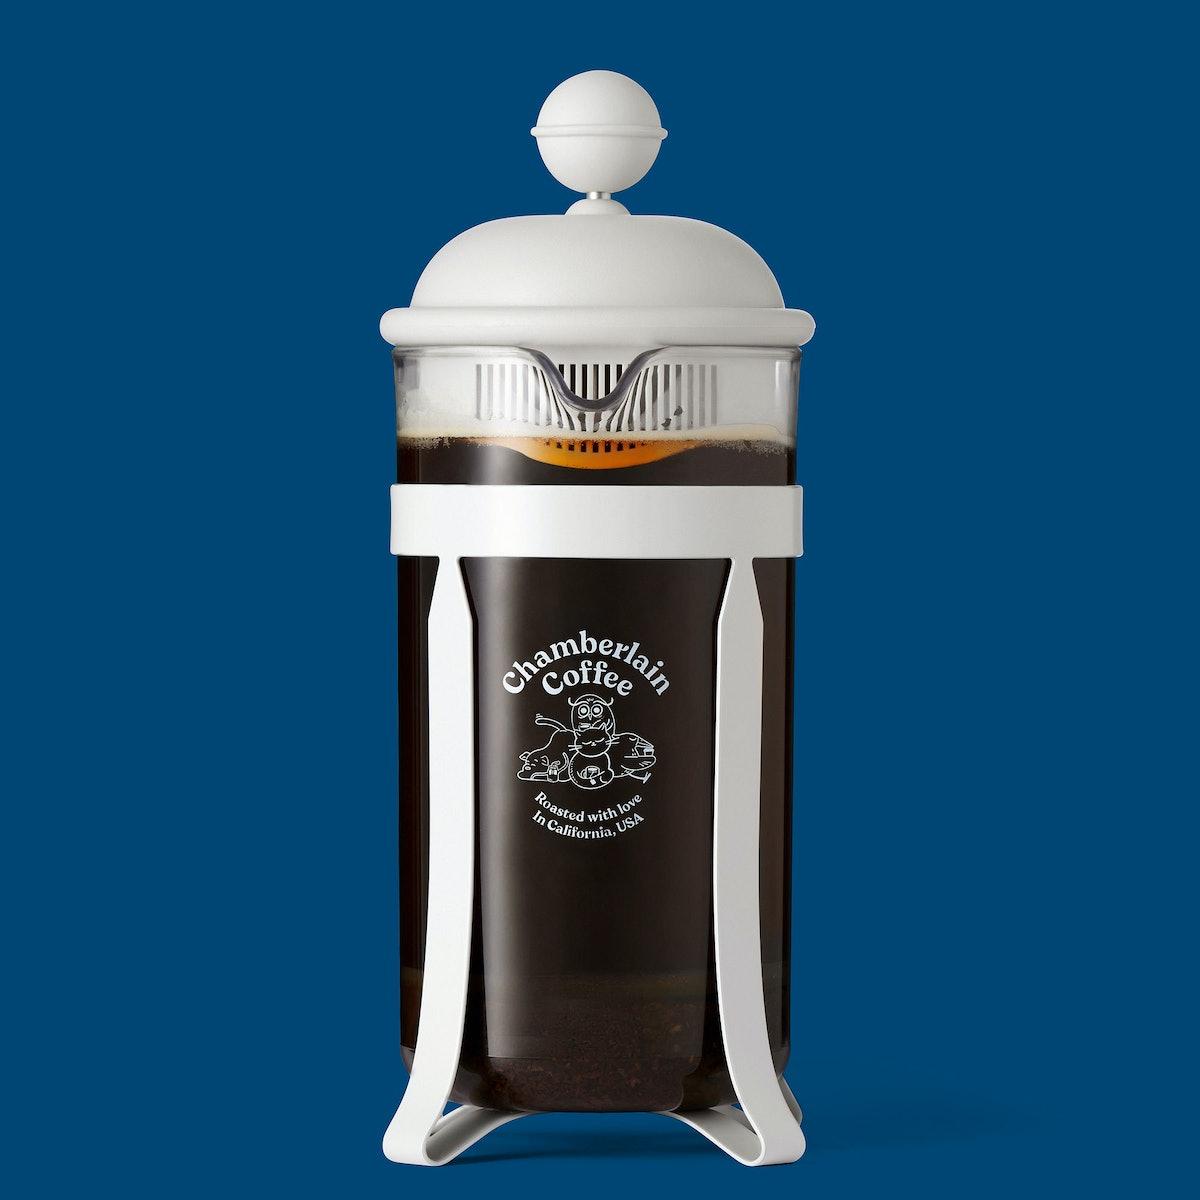 Chamberlain Coffee x Bodum French Press - 3 Cups